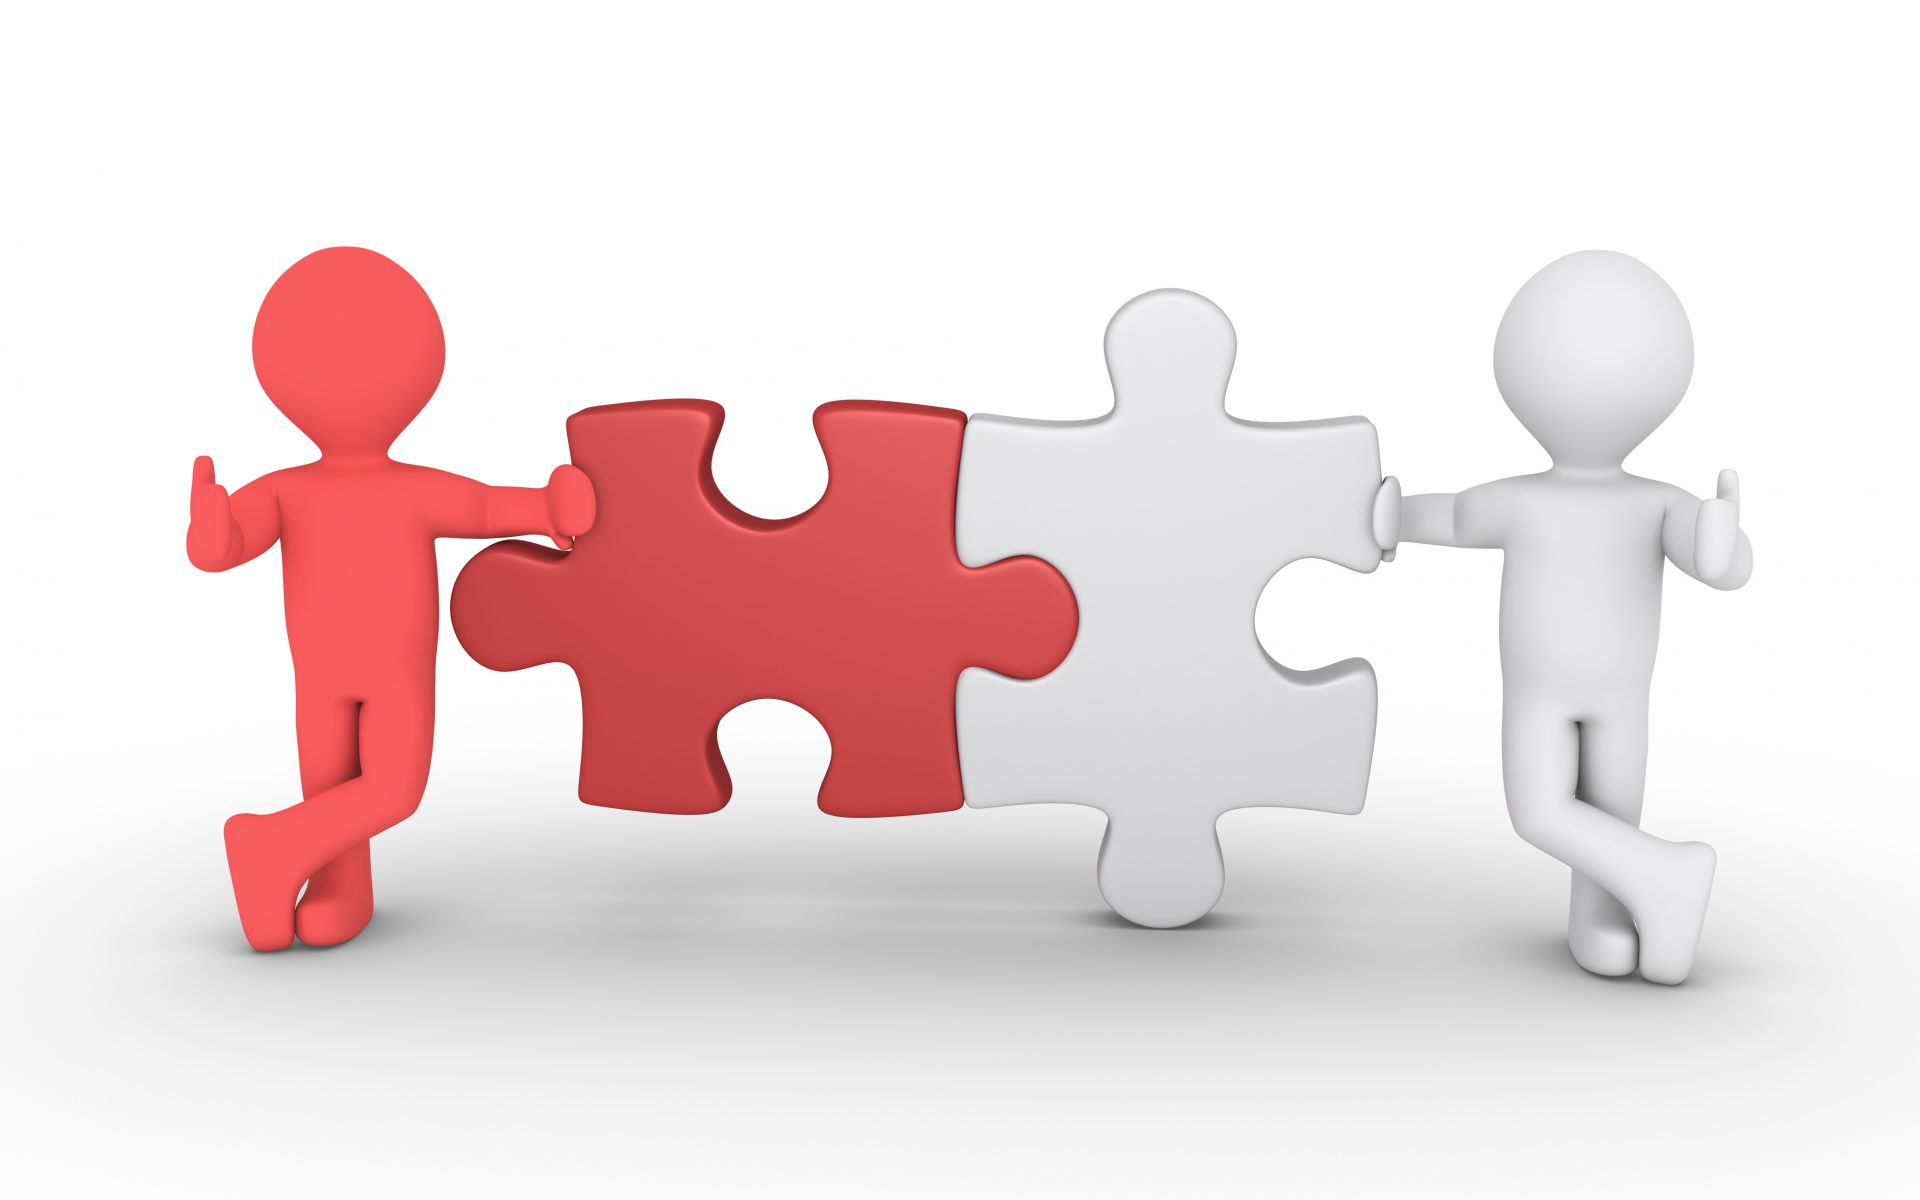 Two puzzle connection concept